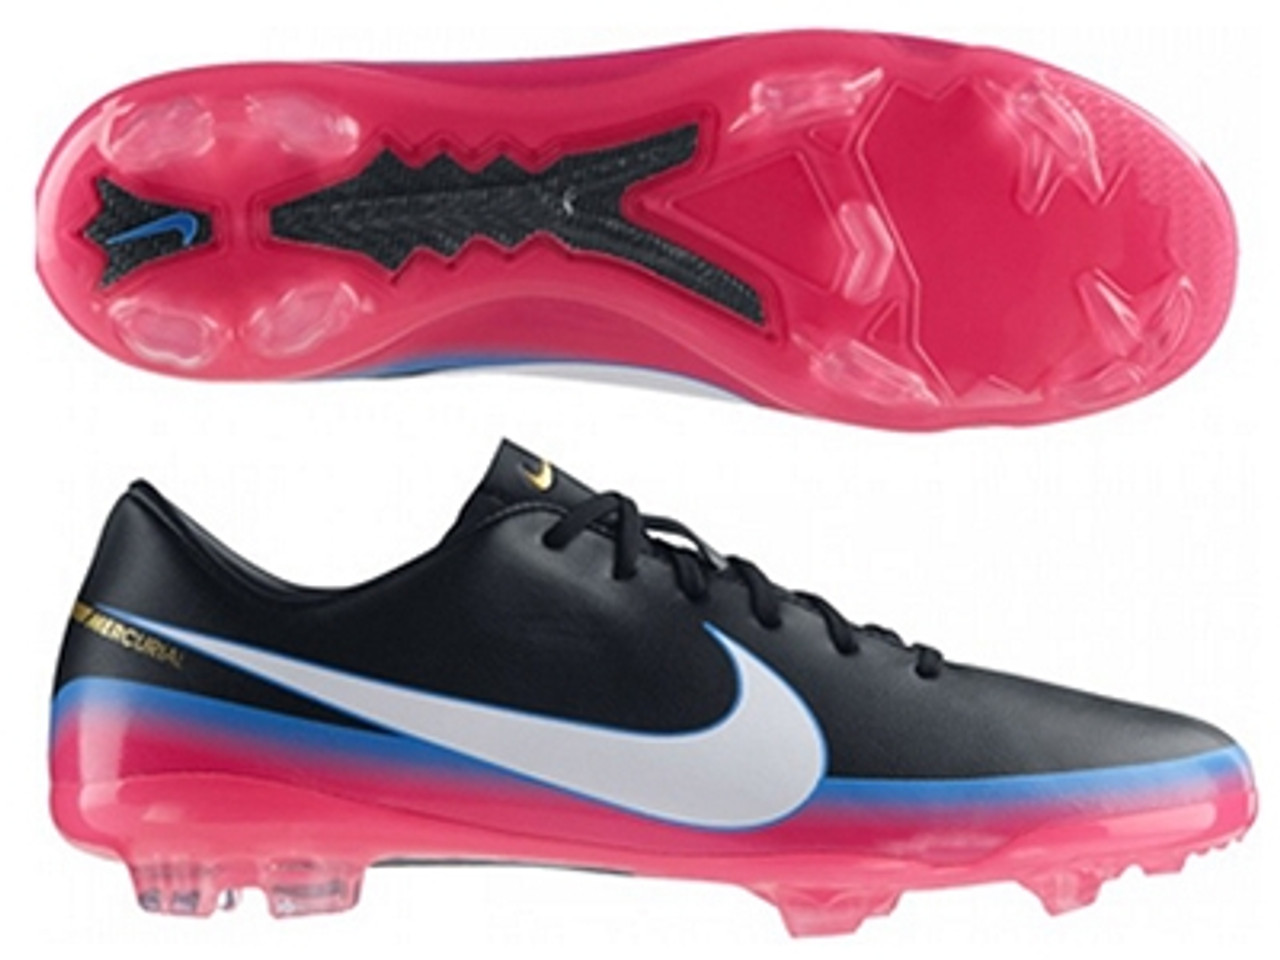 Hacer la cama Rechazo abuela  NIKE CR7 JR MERCURIAL VAPOR VIII Soccer Cleats Blue Glow/Pink Flash -  Soccer Plus